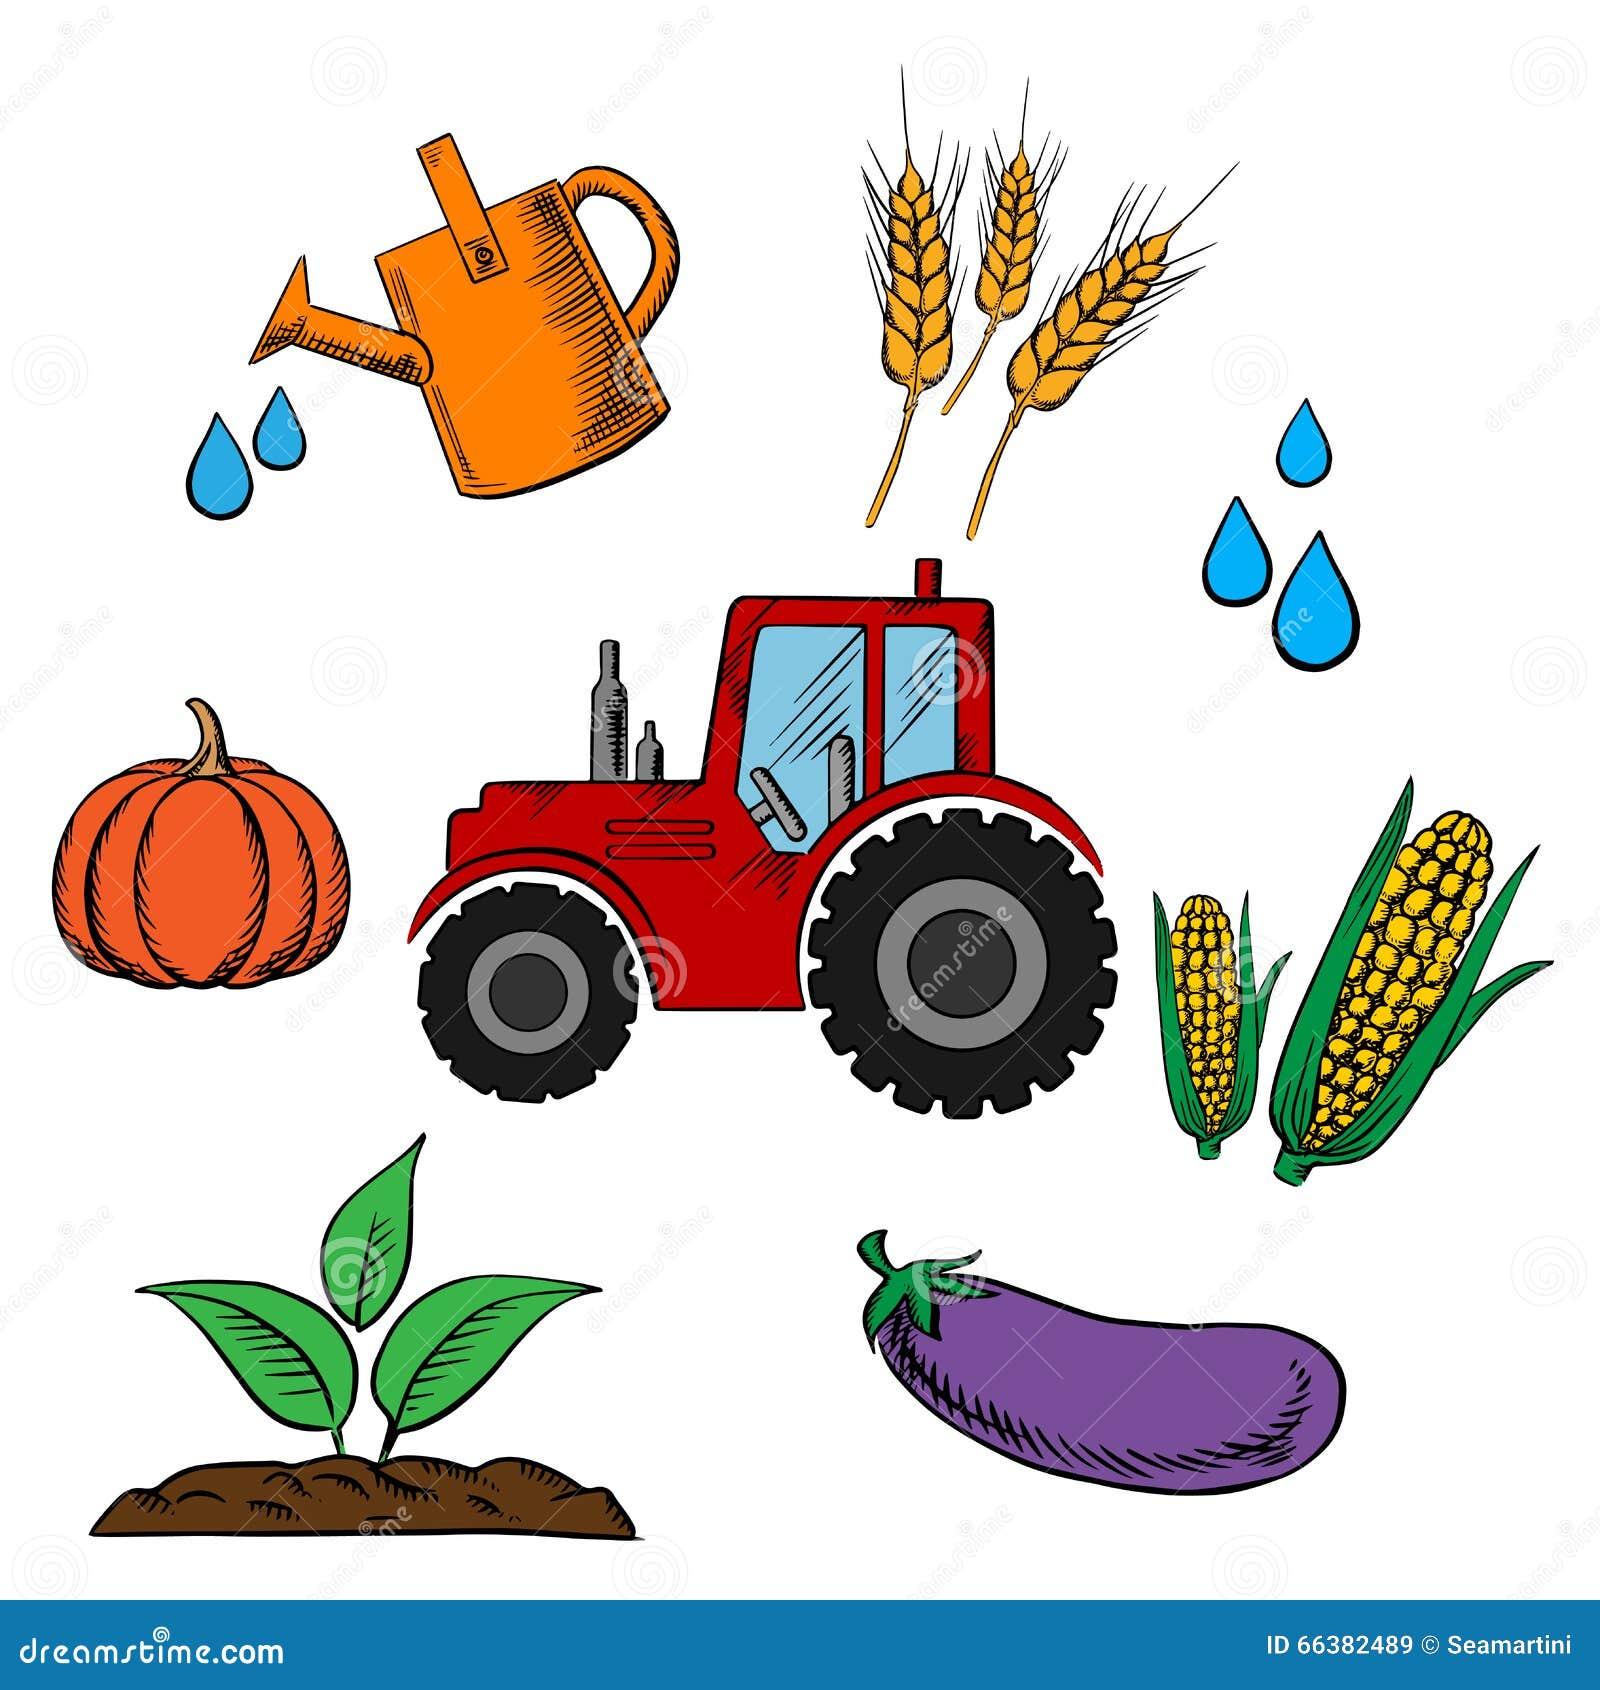 corn images cartoon